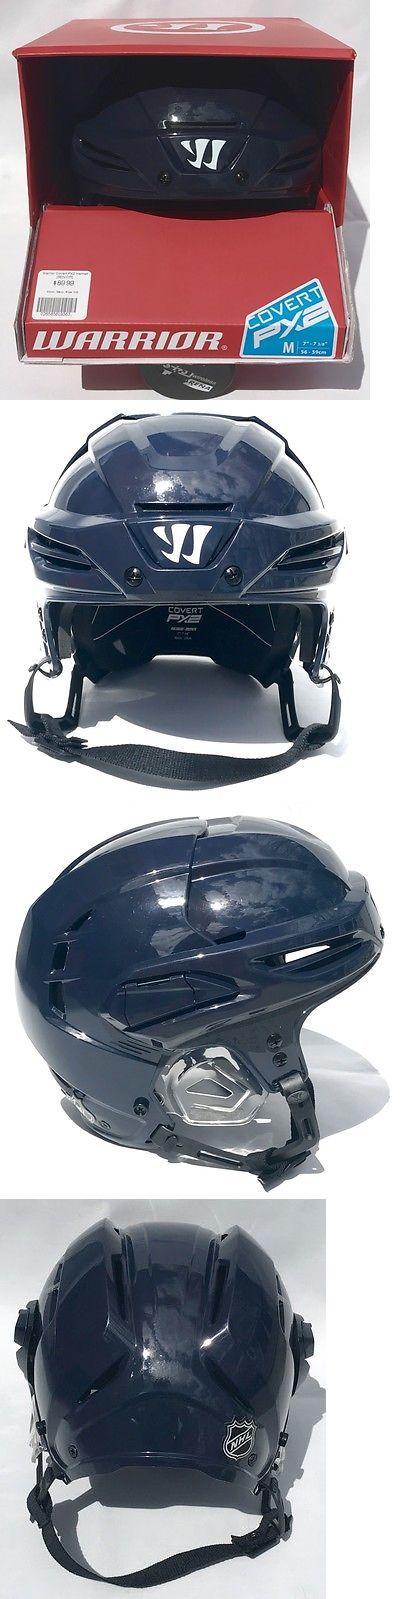 Helmets 20854: New Warrior Covert Px2 Hockey Helmet - Navy Size Medium -> BUY IT NOW ONLY: $85 on eBay!